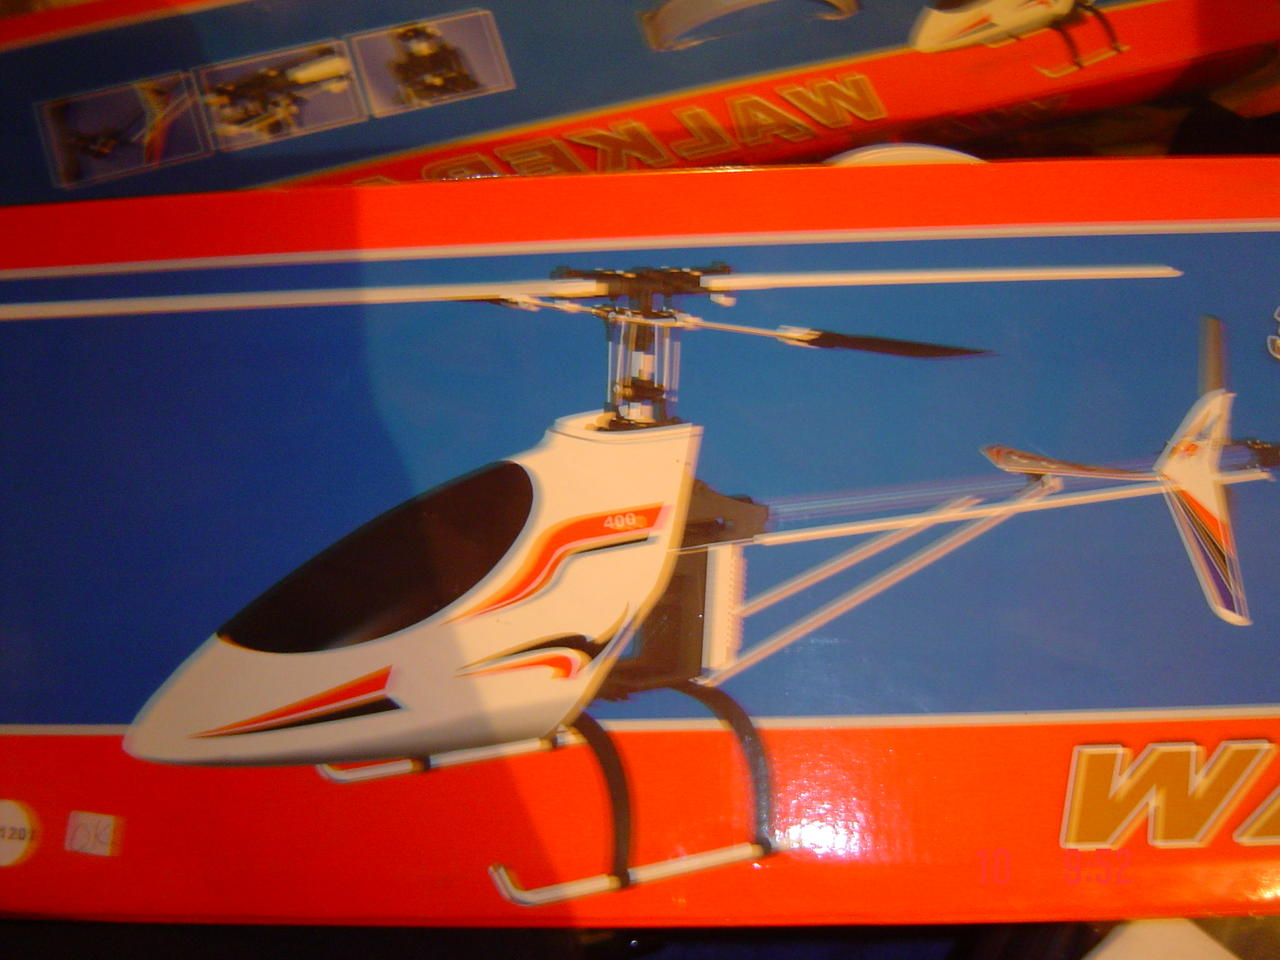 Elicottero Walkera : Elicottero walkera baronerosso forum modellismo